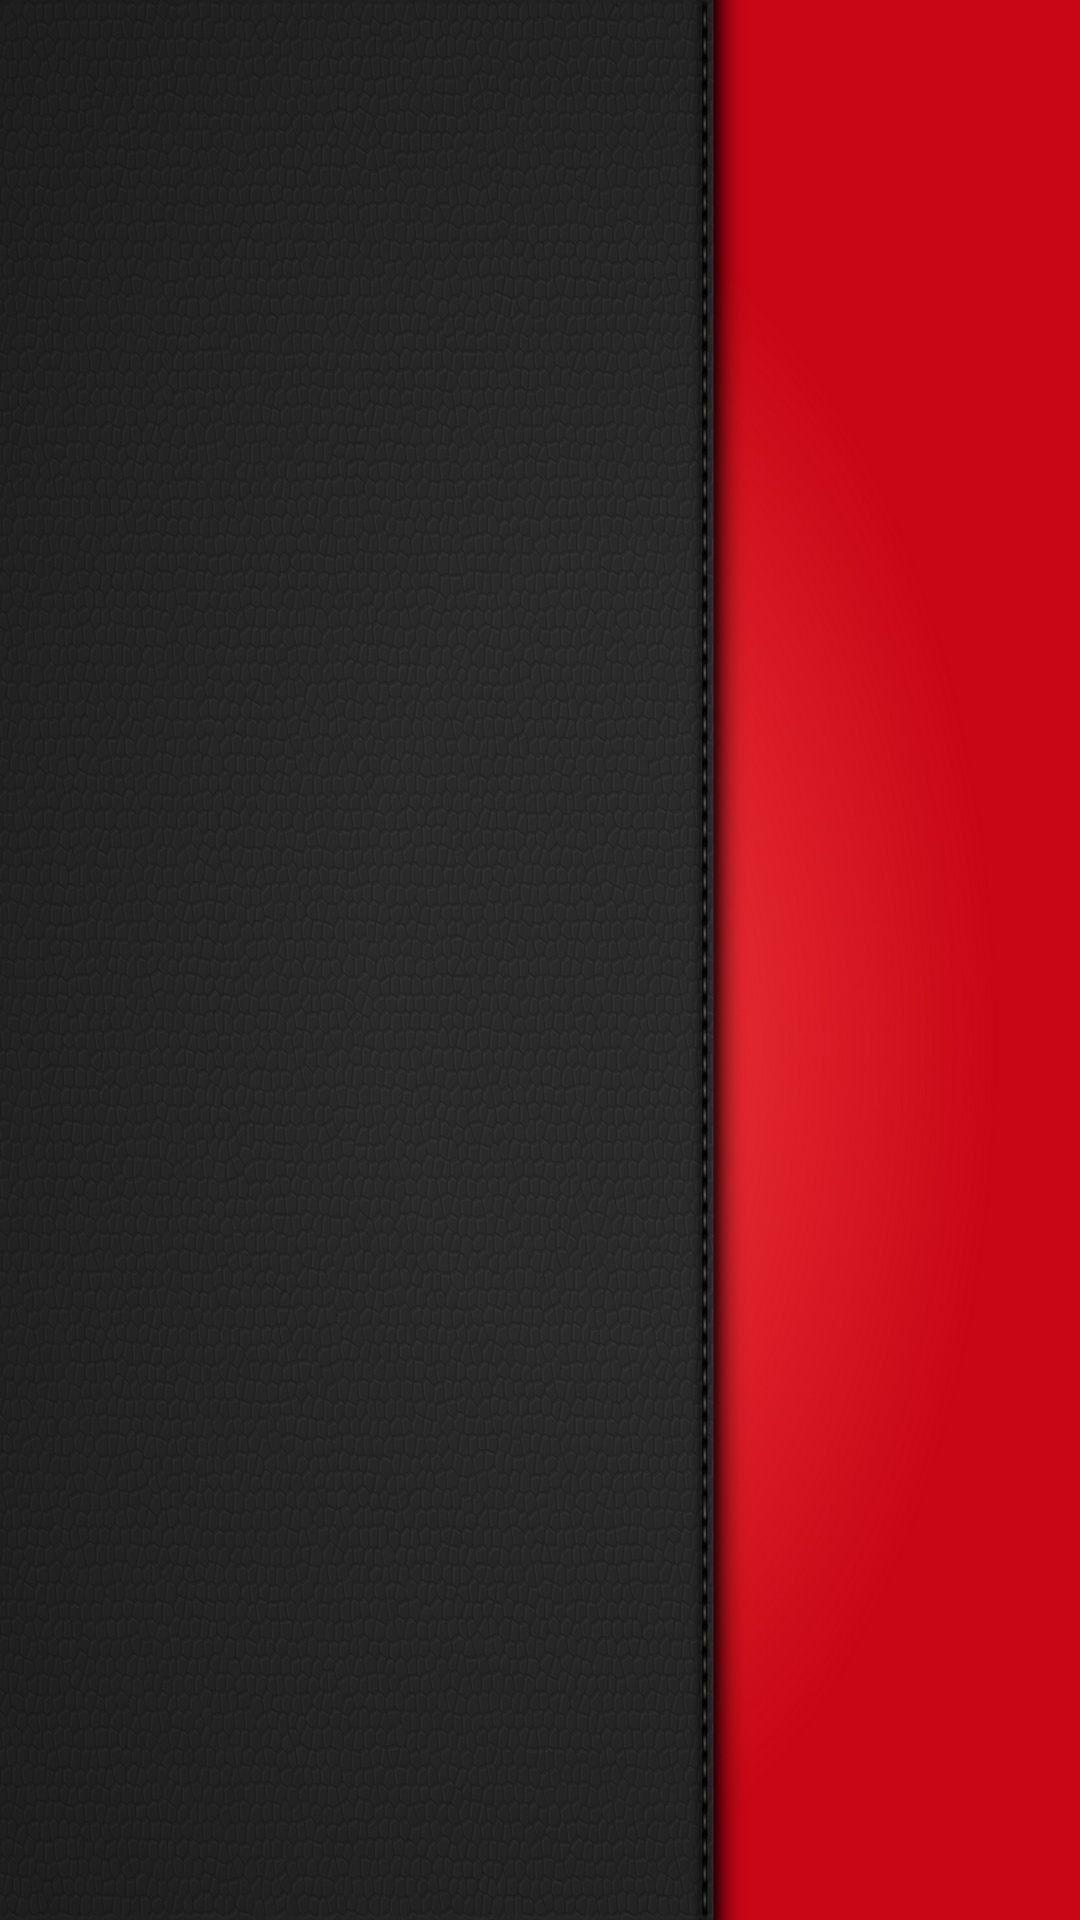 1080x1920 0 Orange Black Wallpaper Group Red Iphone 6 Plus